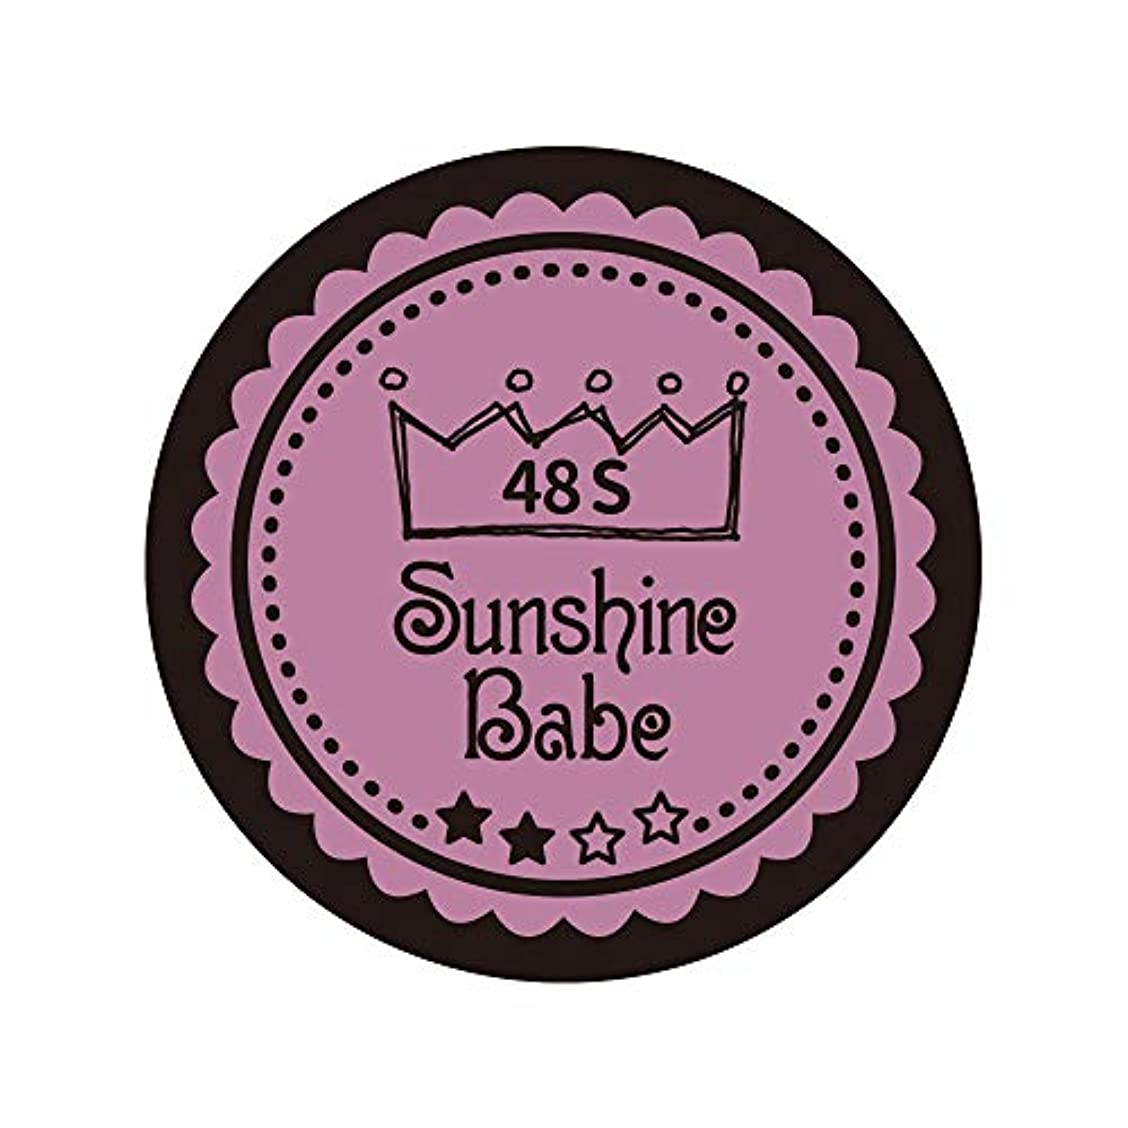 科学的重量未亡人Sunshine Babe カラージェル 48S ペールモーブ 4g UV/LED対応